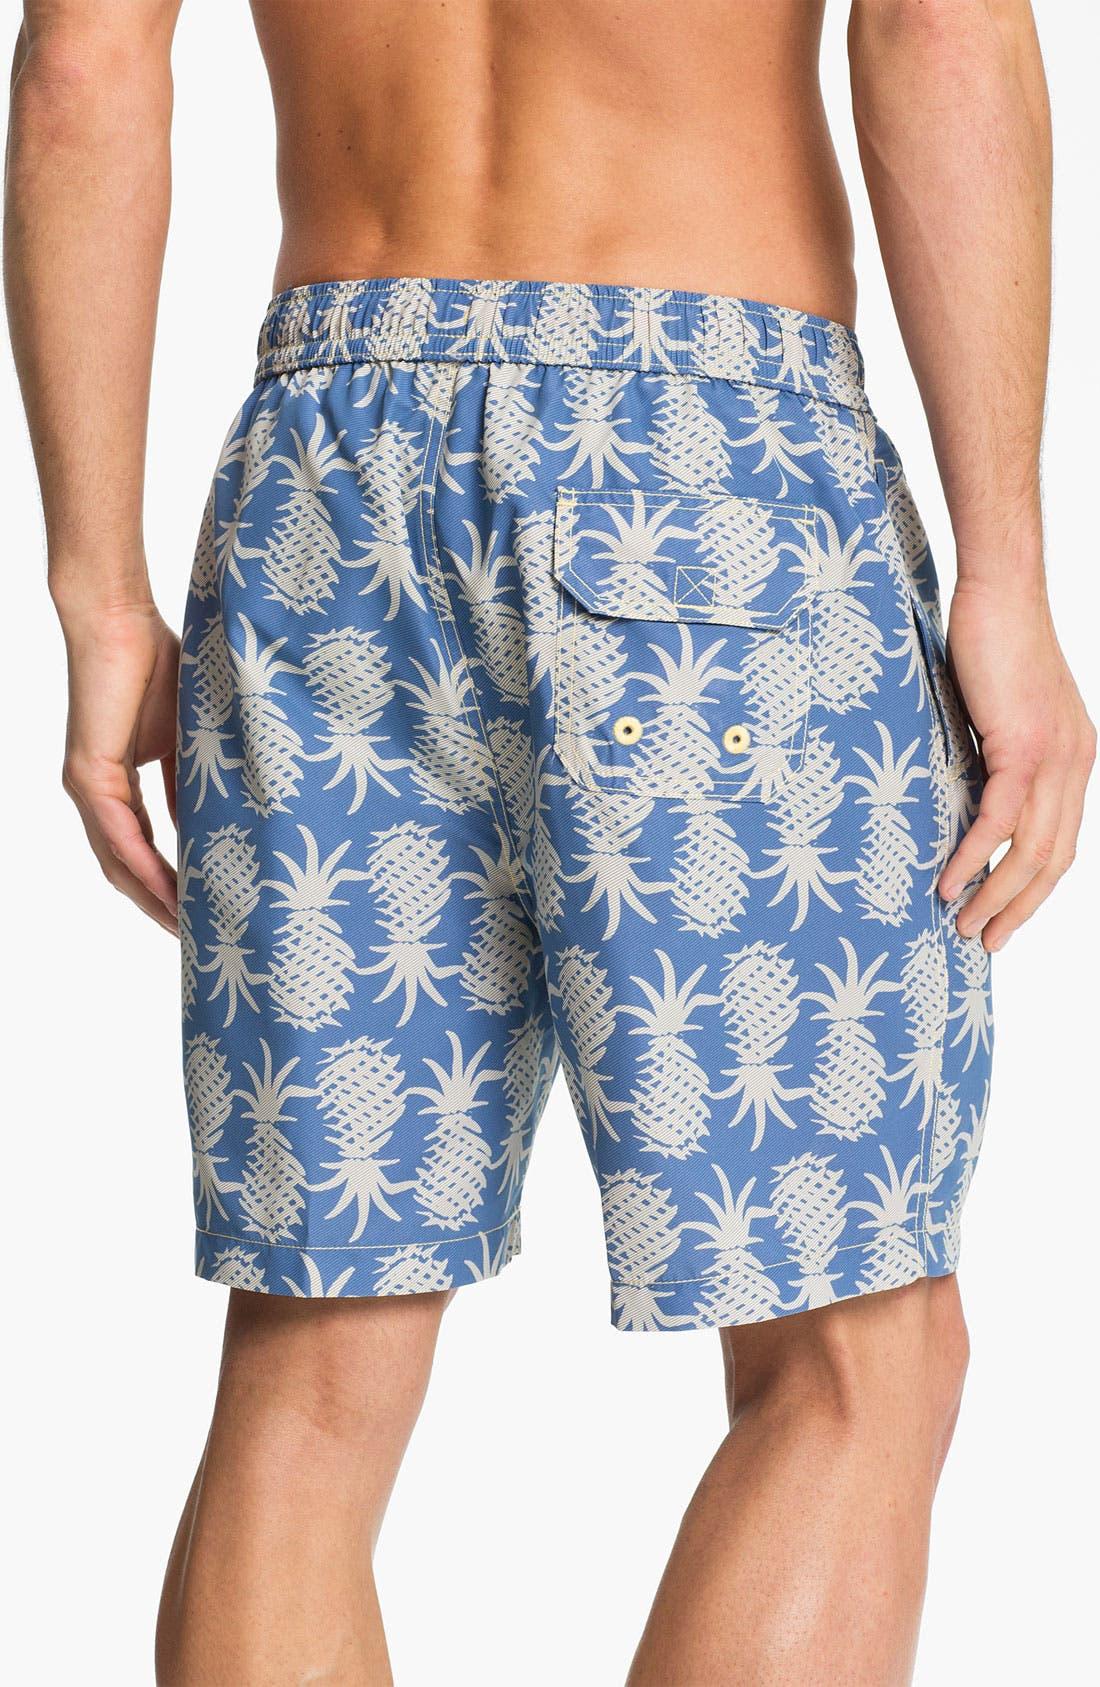 Alternate Image 2  - Tommy Bahama Relax 'Pineapple Upside Down' Swim Trunks